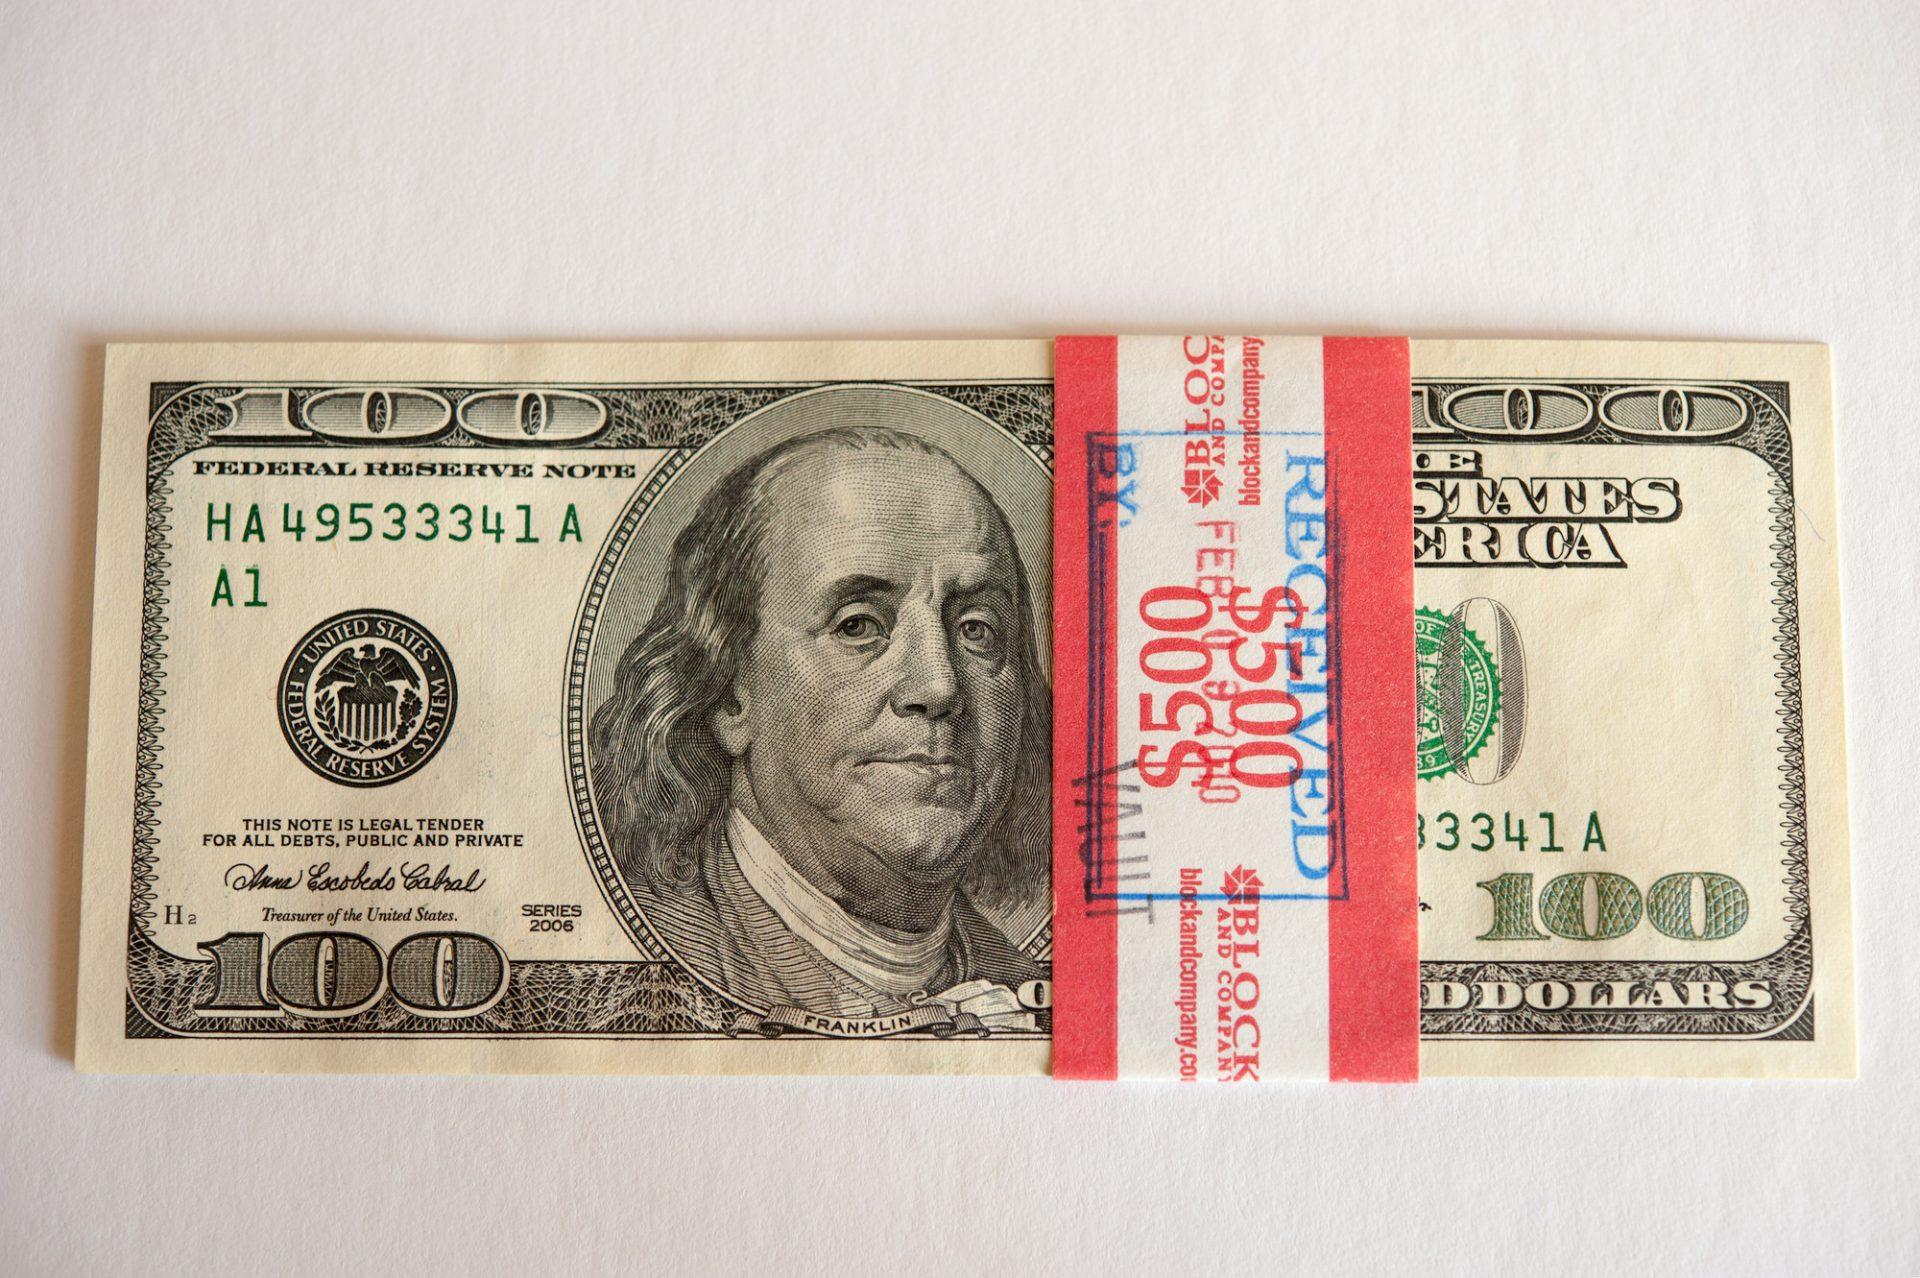 Photo: 500 dollars from the bank, Lincoln, Nebraska.